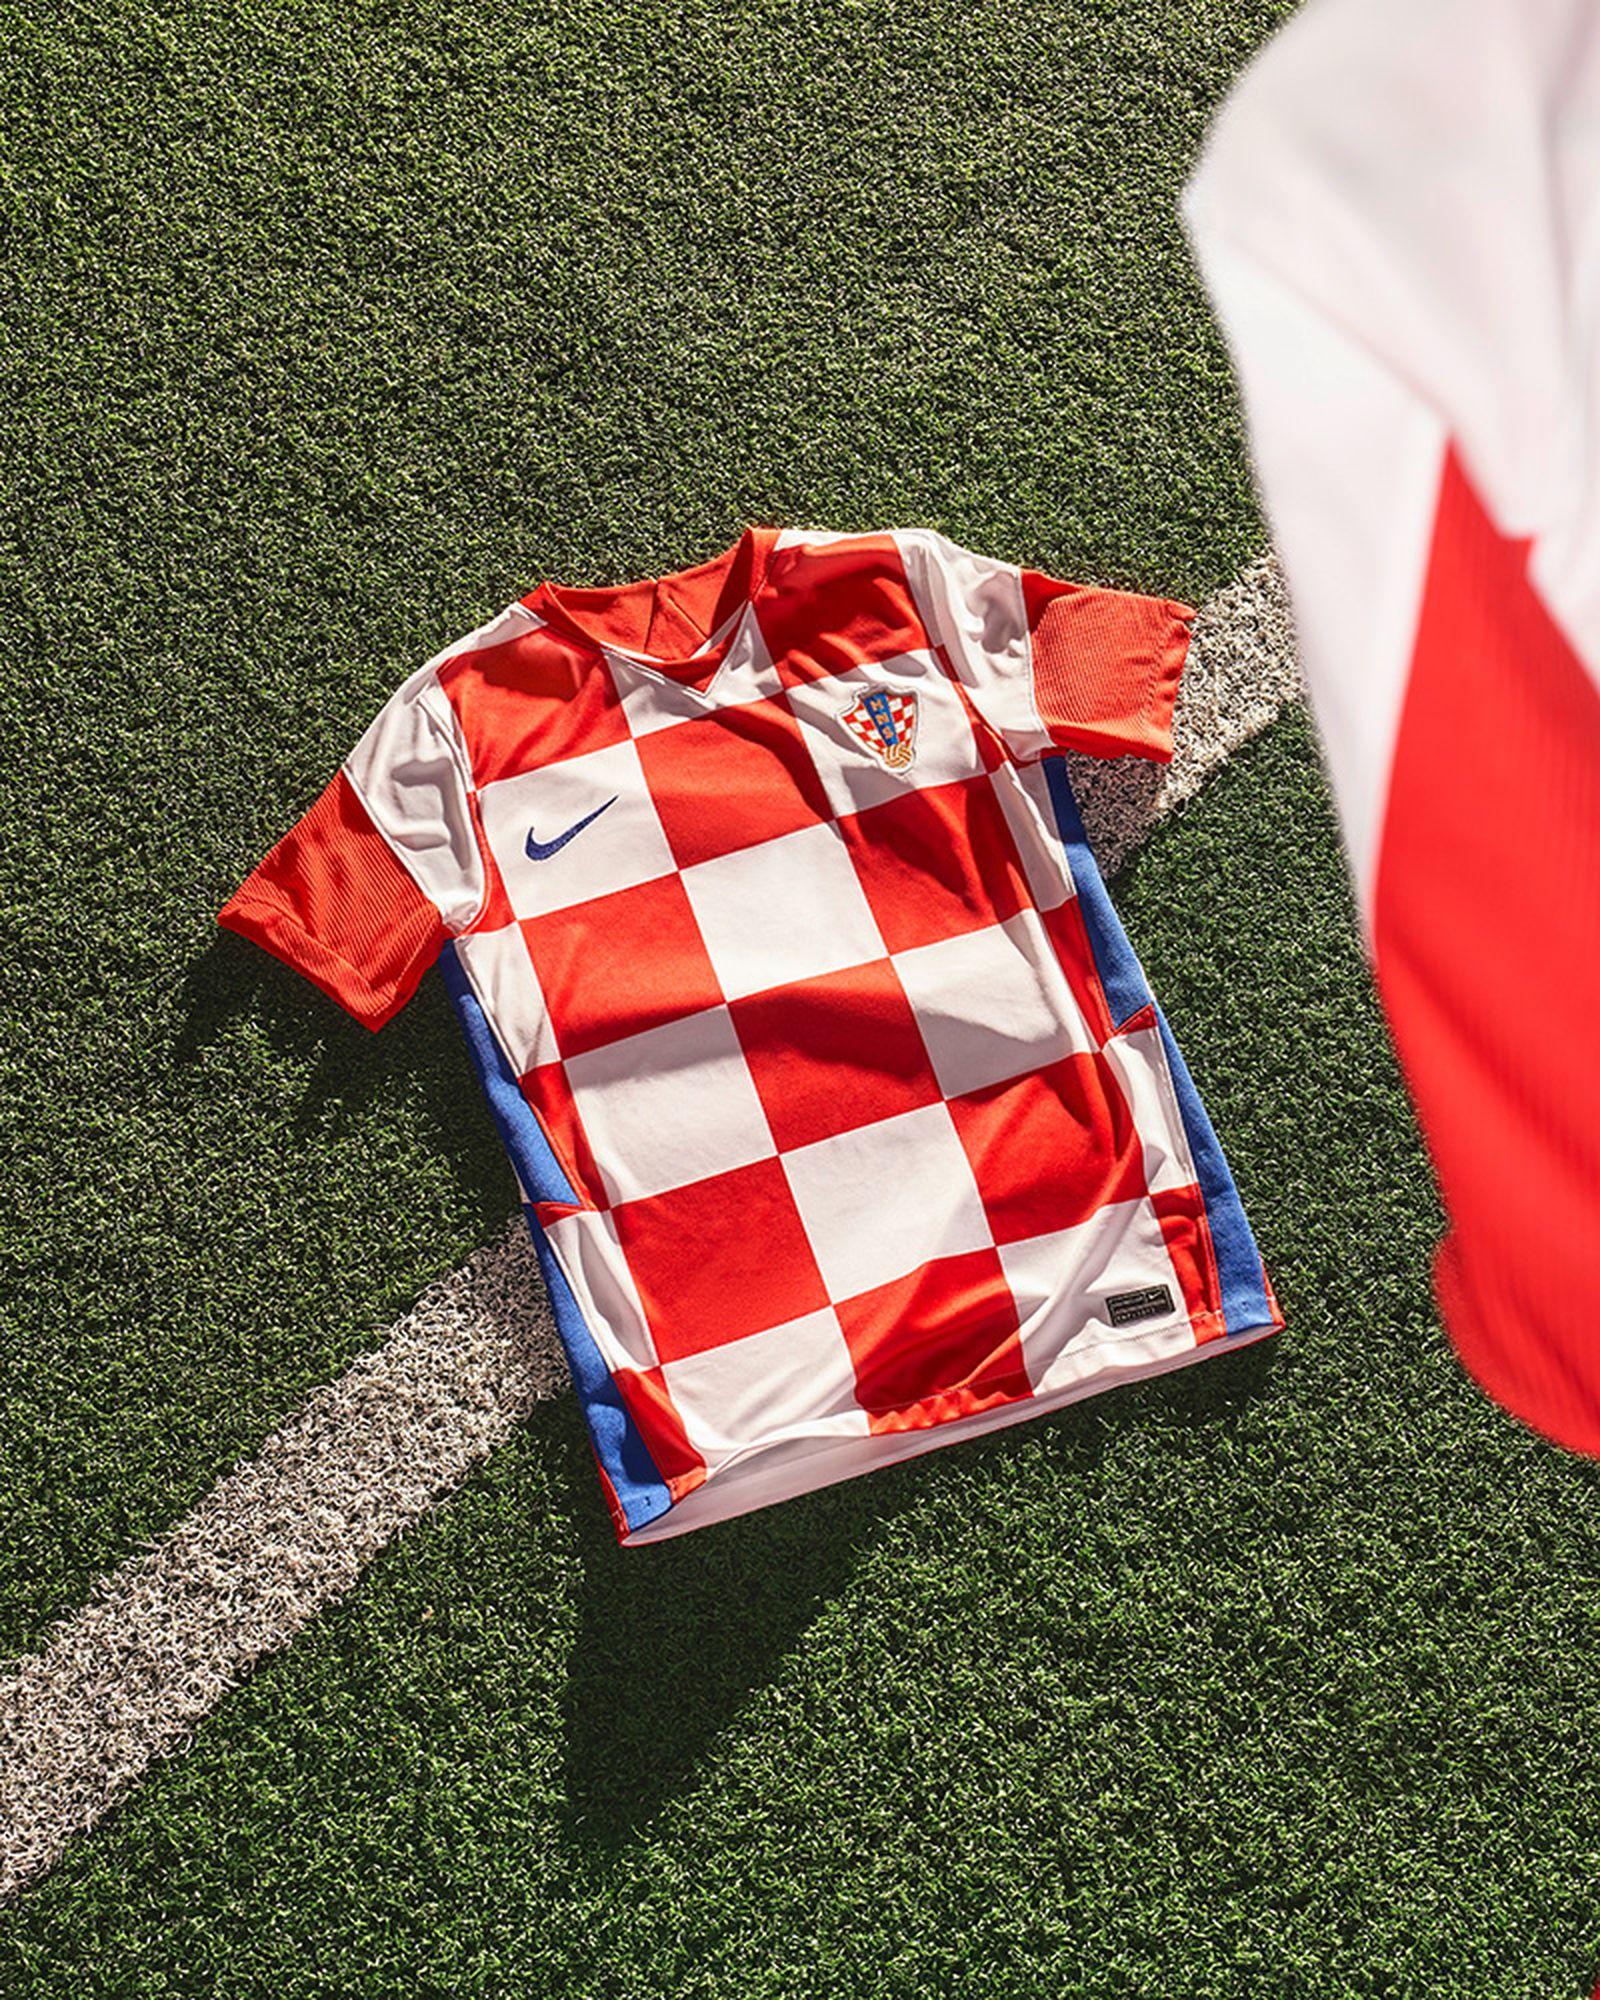 euro-2020-jersey-roundtable-ranking-012